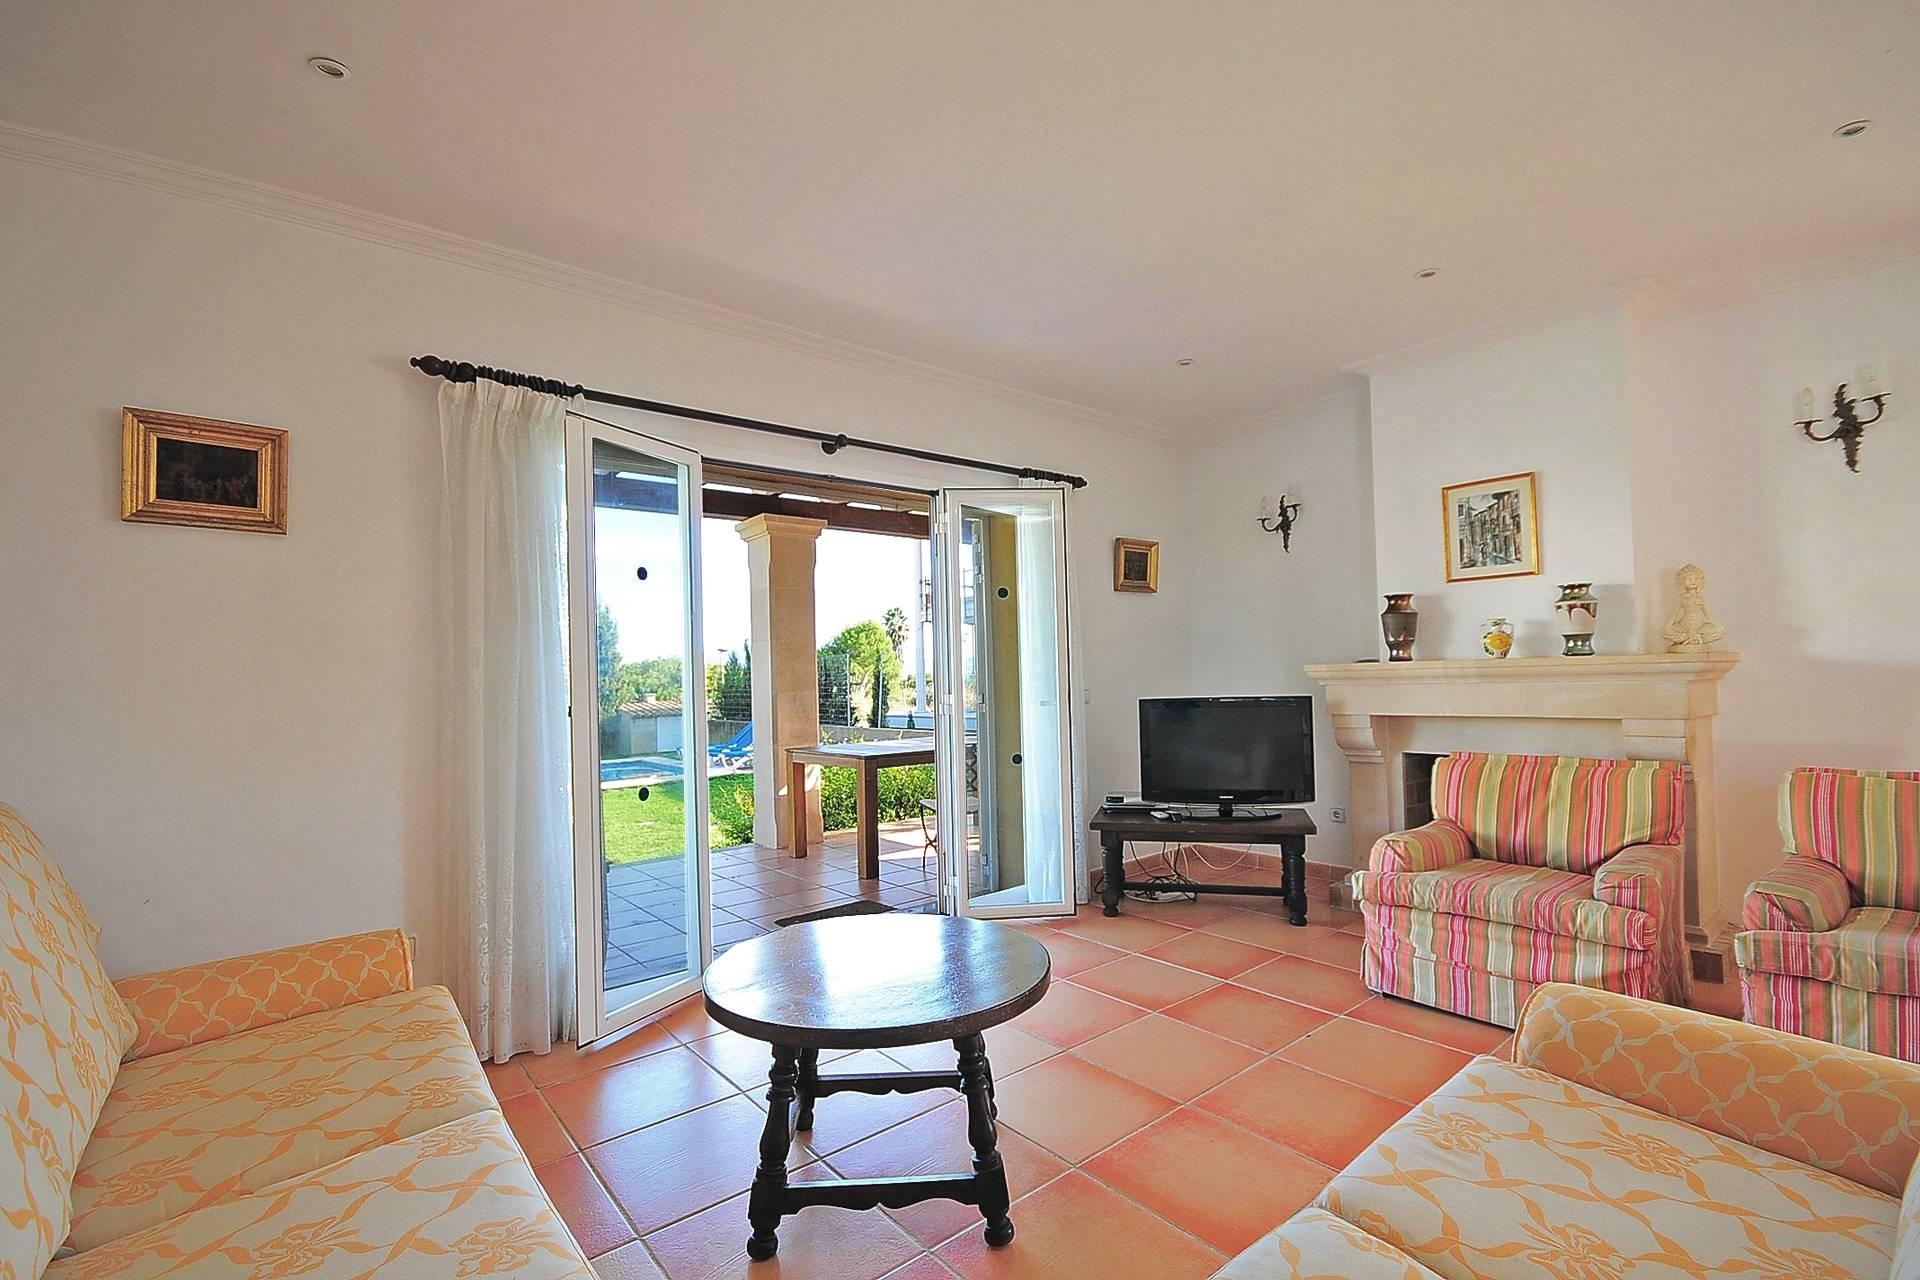 01-233 Ferienhaus am Strand Mallorca Norden Bild 9